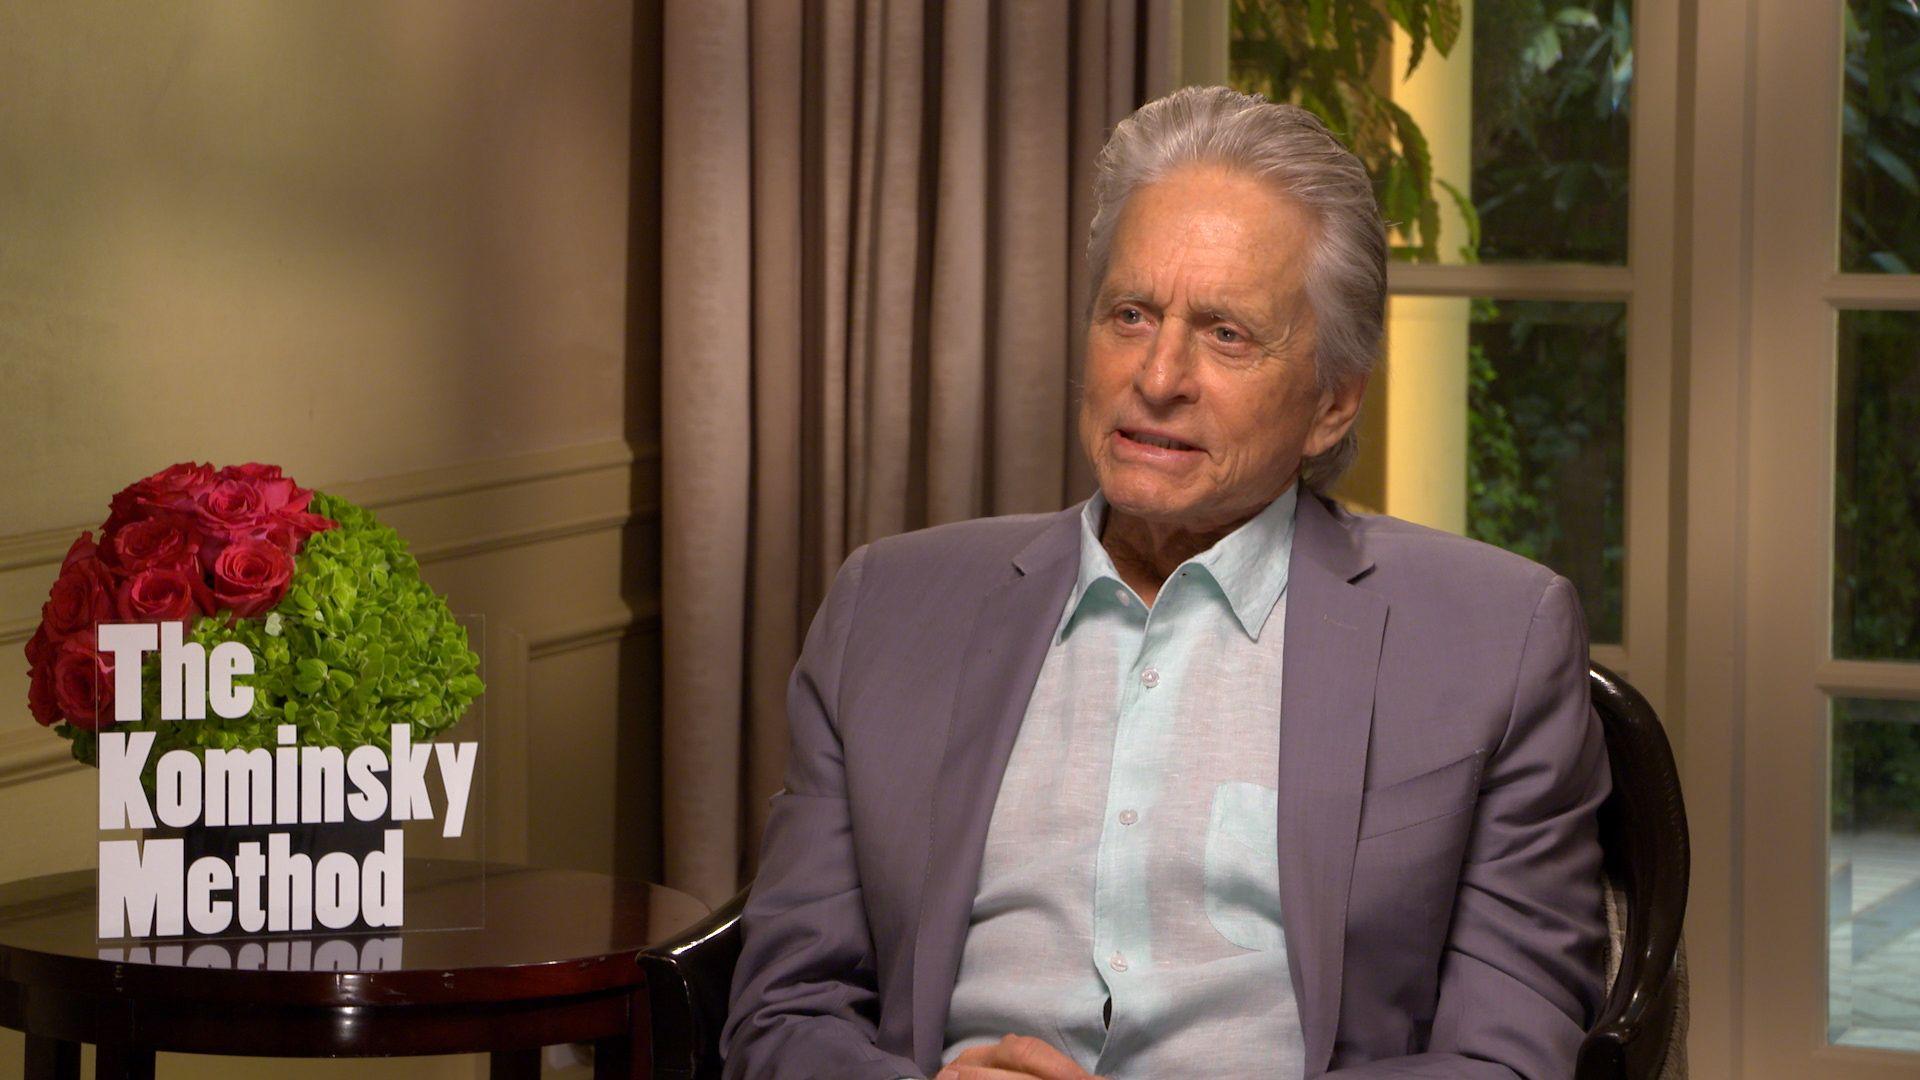 Michael Douglas Talks 'The Kominsky Method' Season 2 and When He Shoots 'Ant-Man 3' - Collider.com